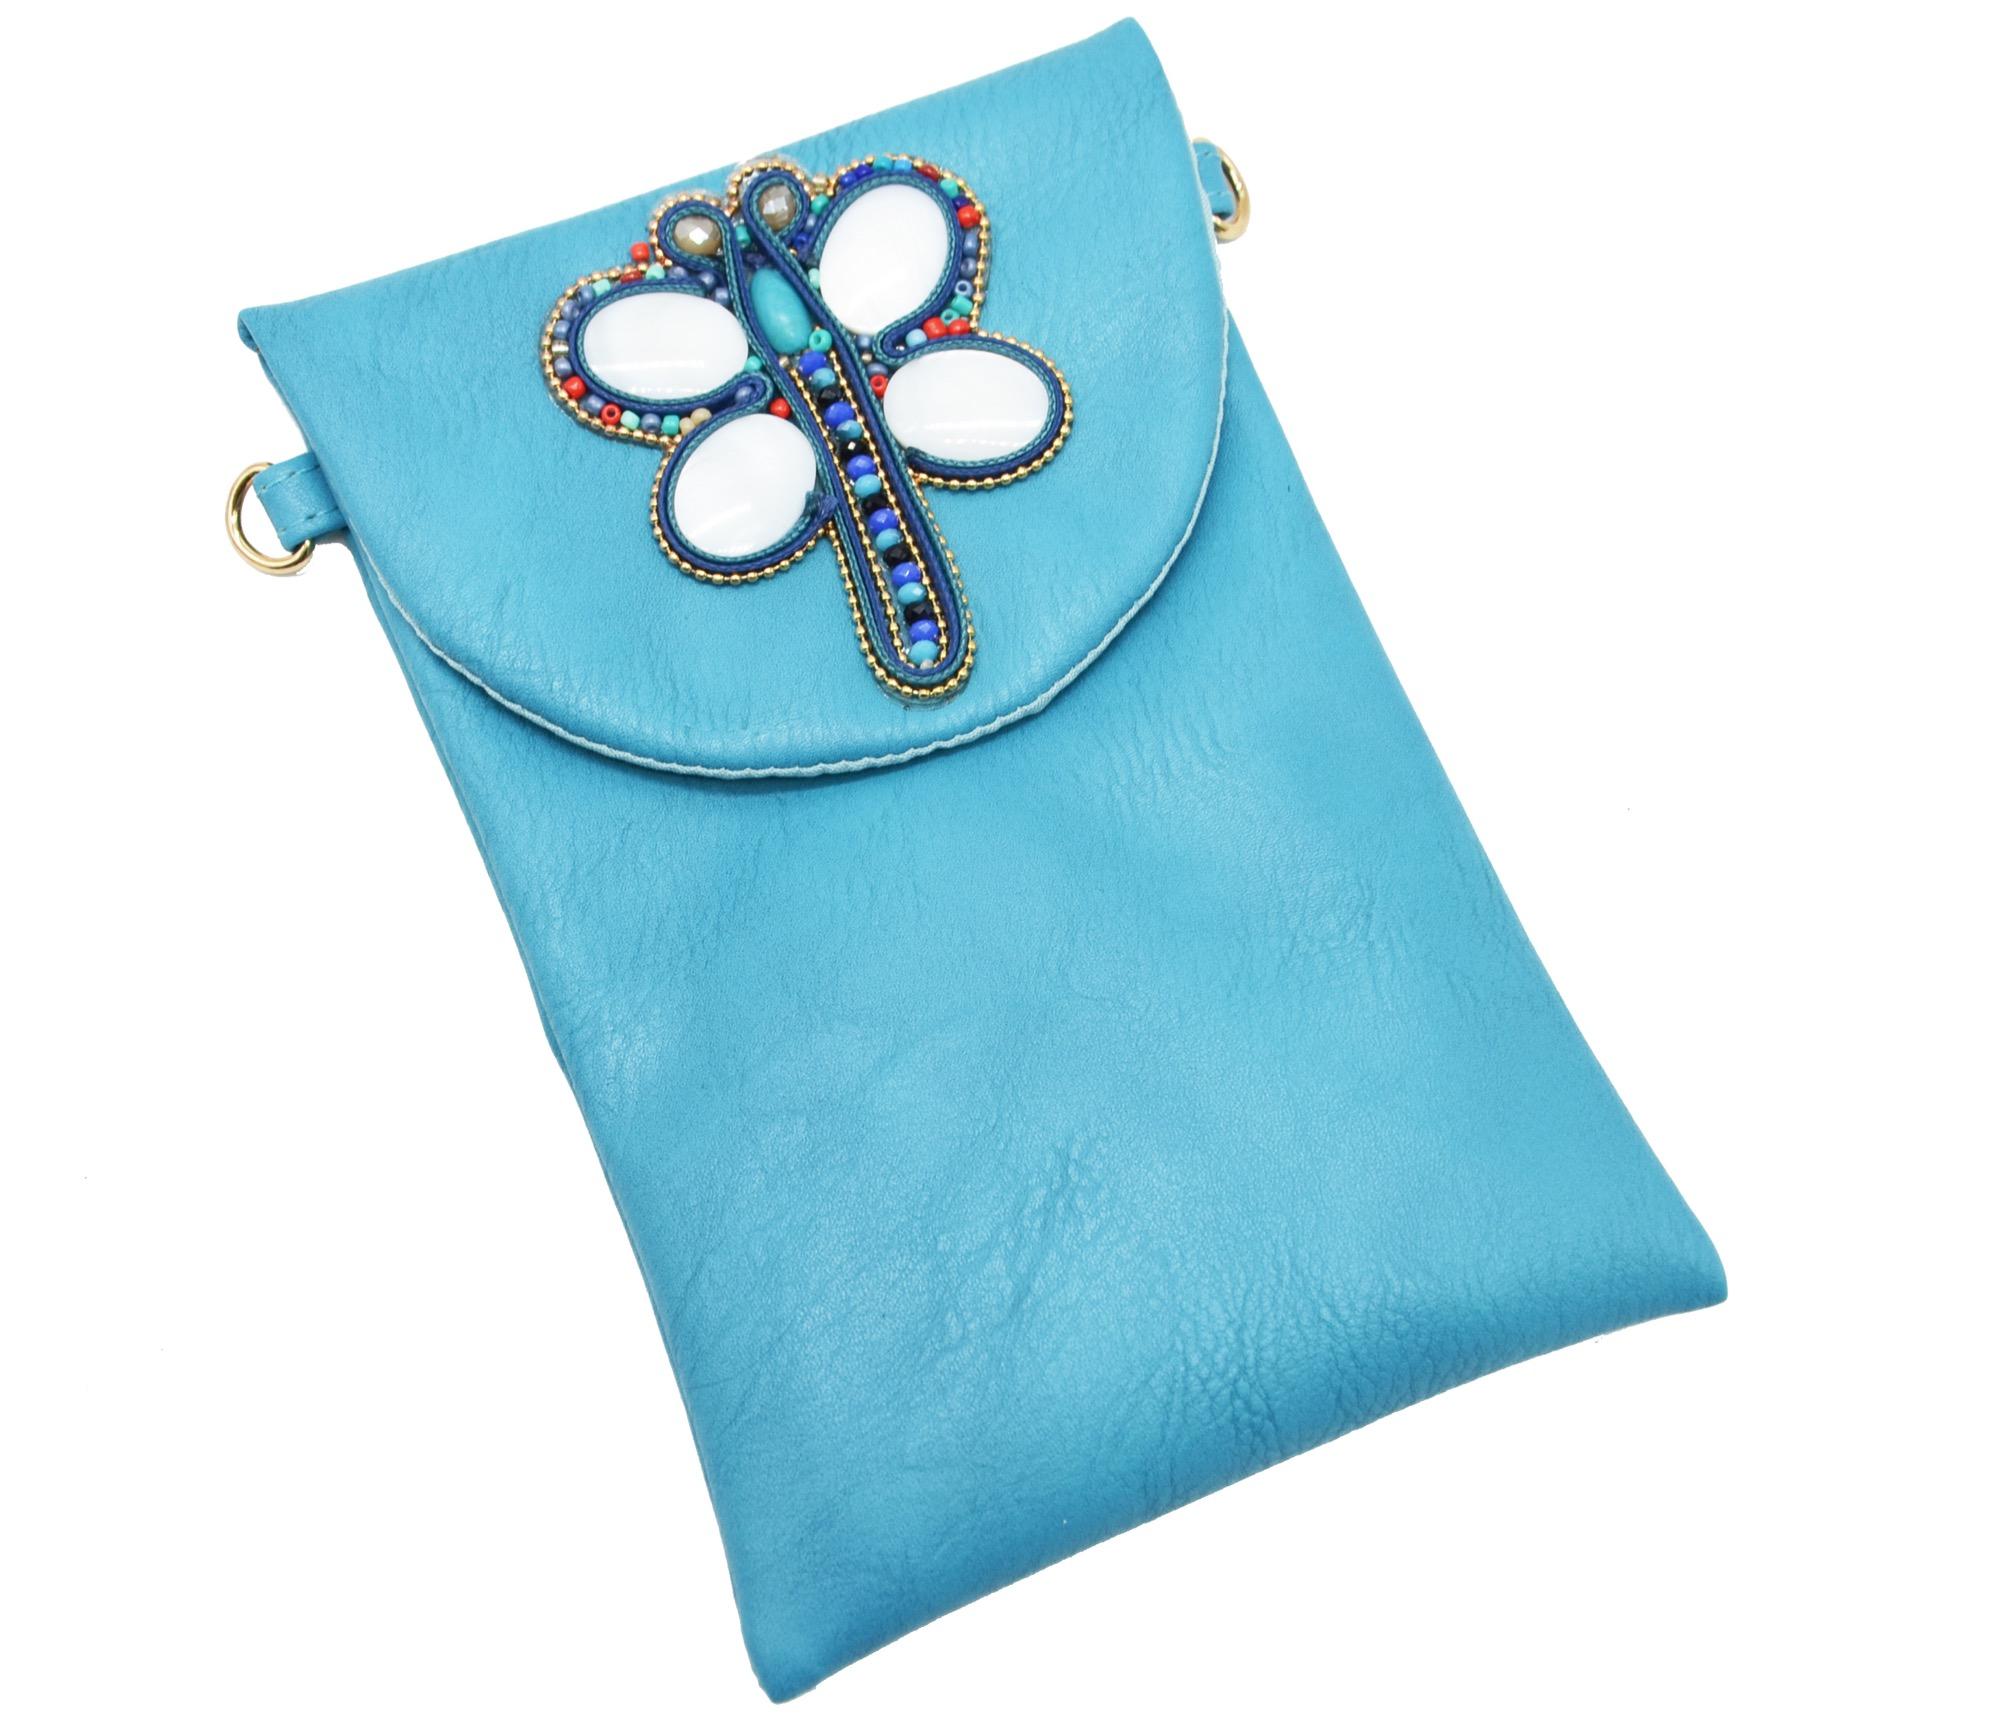 Pochette Avec Libellule Pch42 Simili Sac Bleu Mini Cuir POTXZiuk